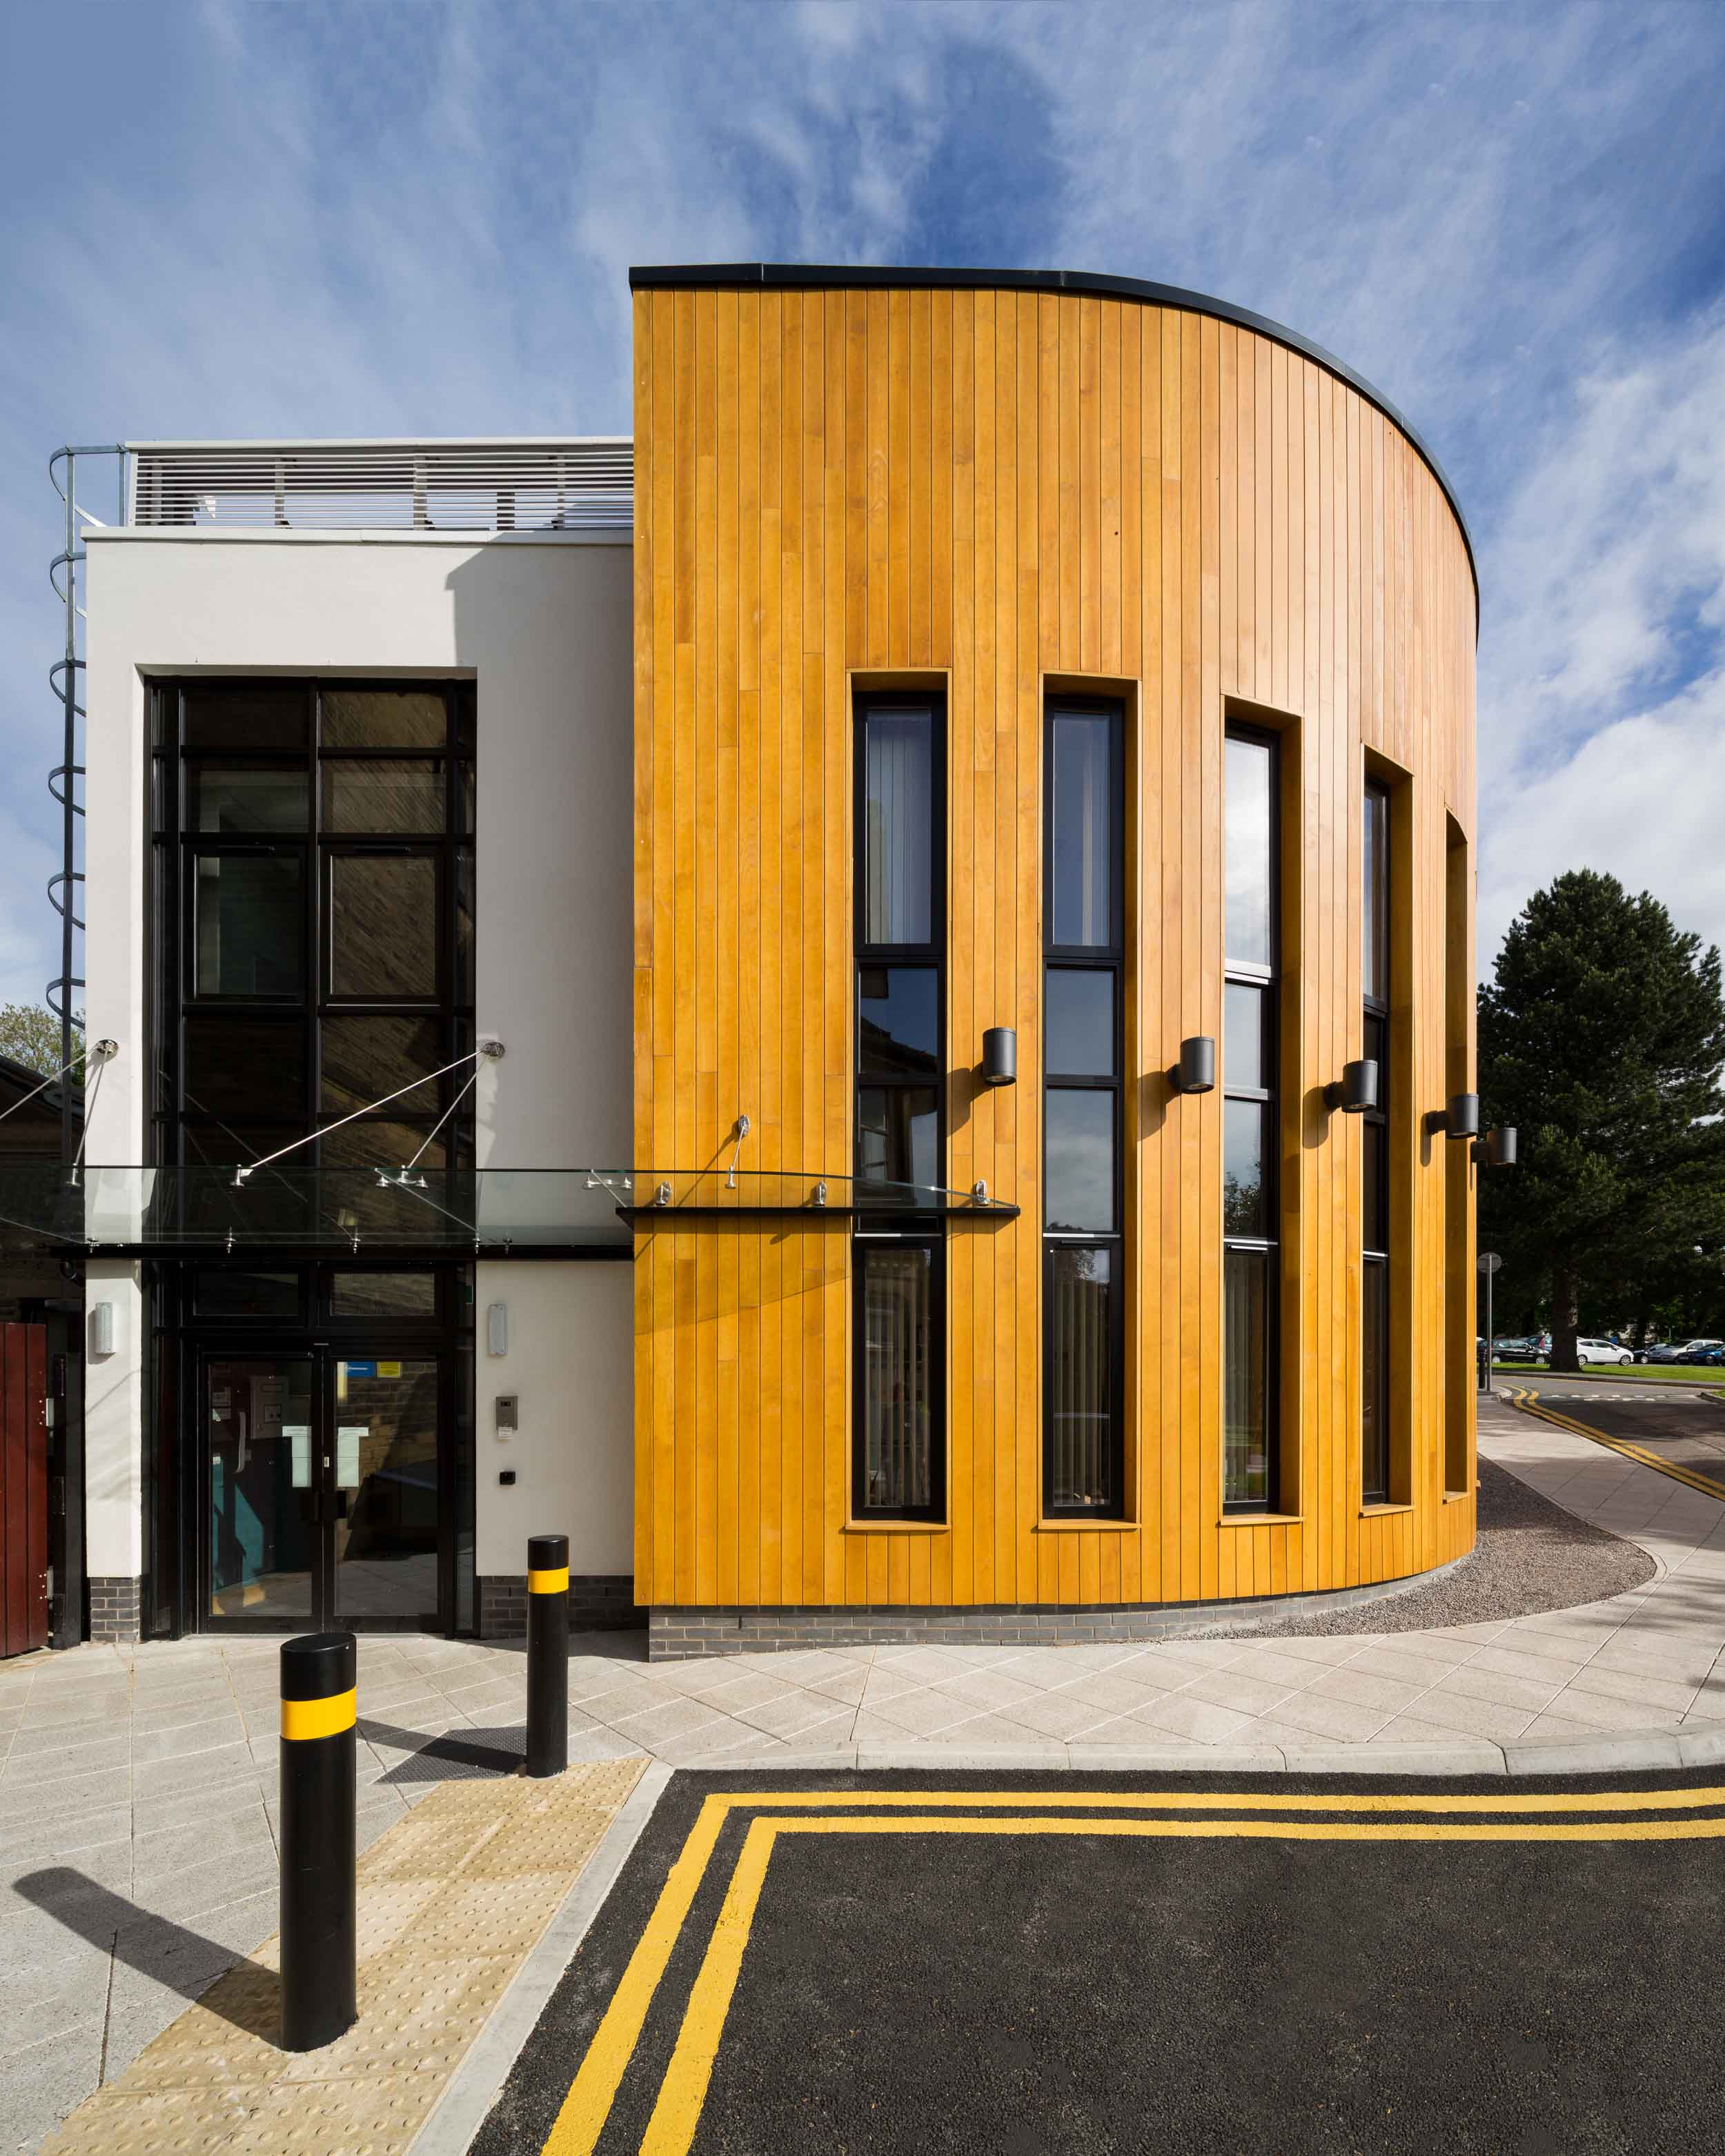 bradford royal infirmary temple bank house new building exterior.jpg